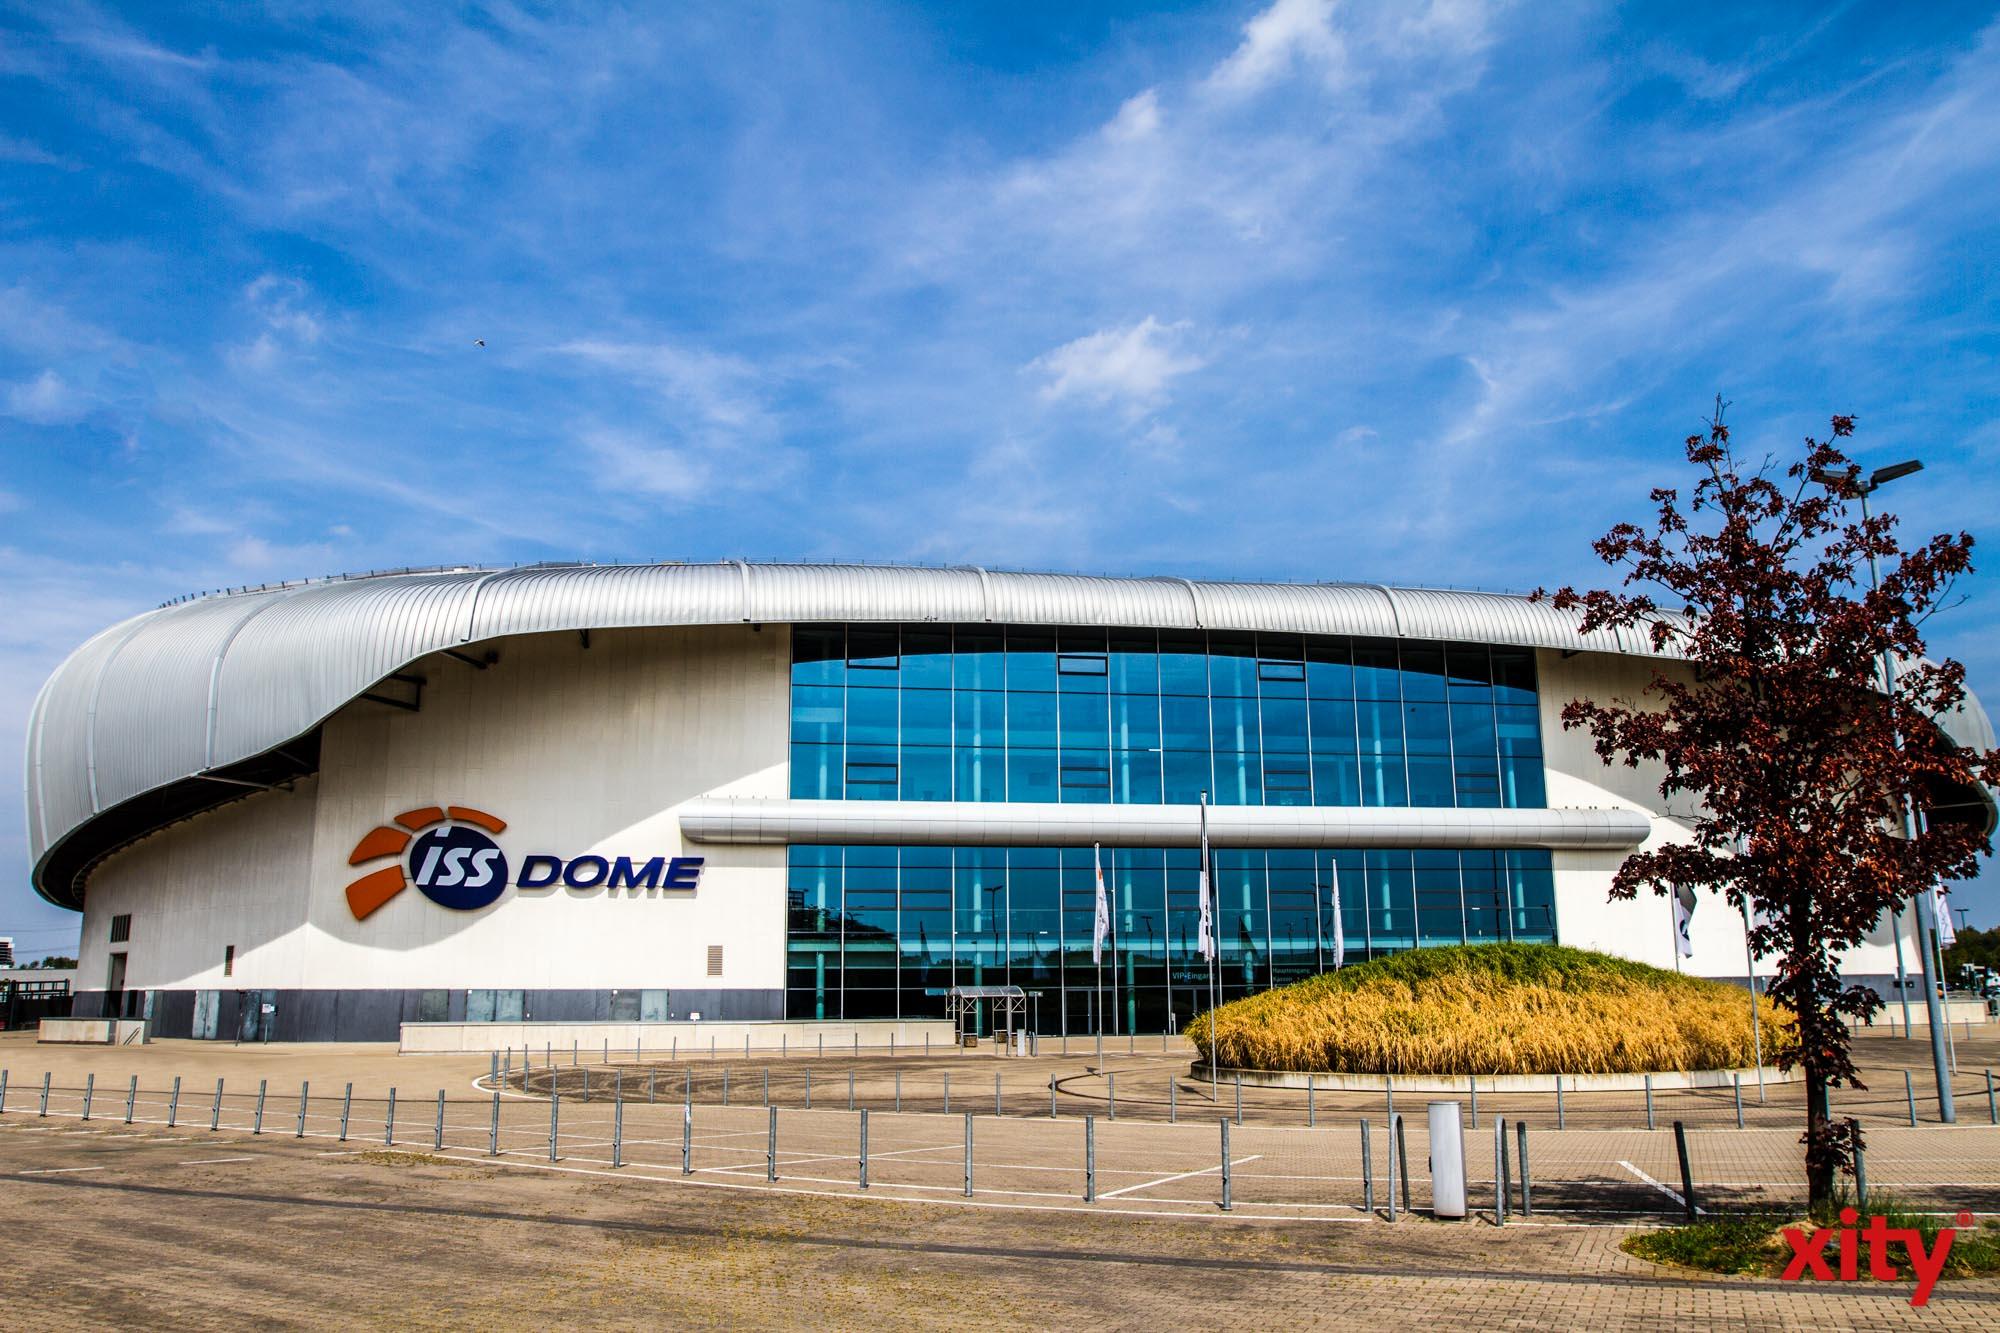 Rat der Landeshauptstadt tagt im ISS Dome (Foto: xity)